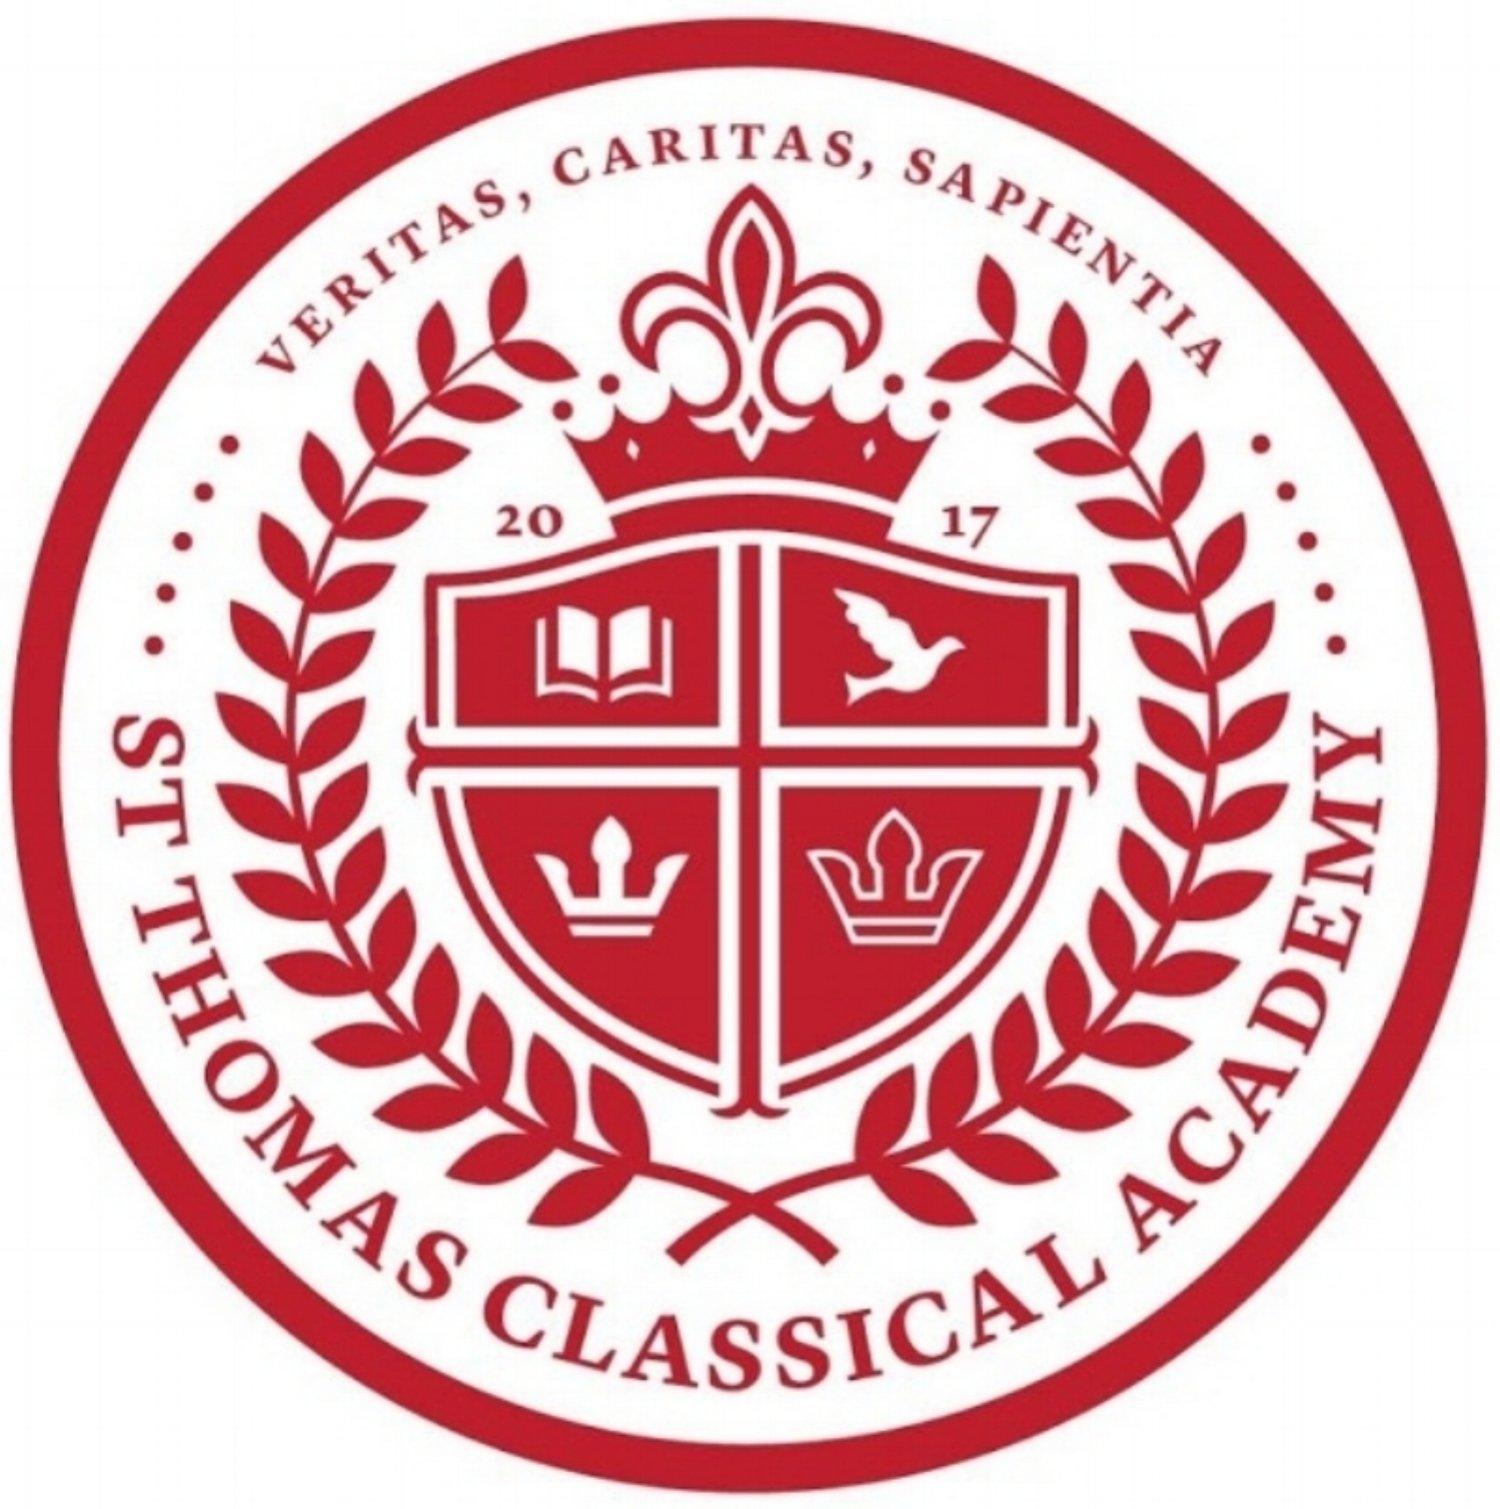 St Thomas Classical Academy